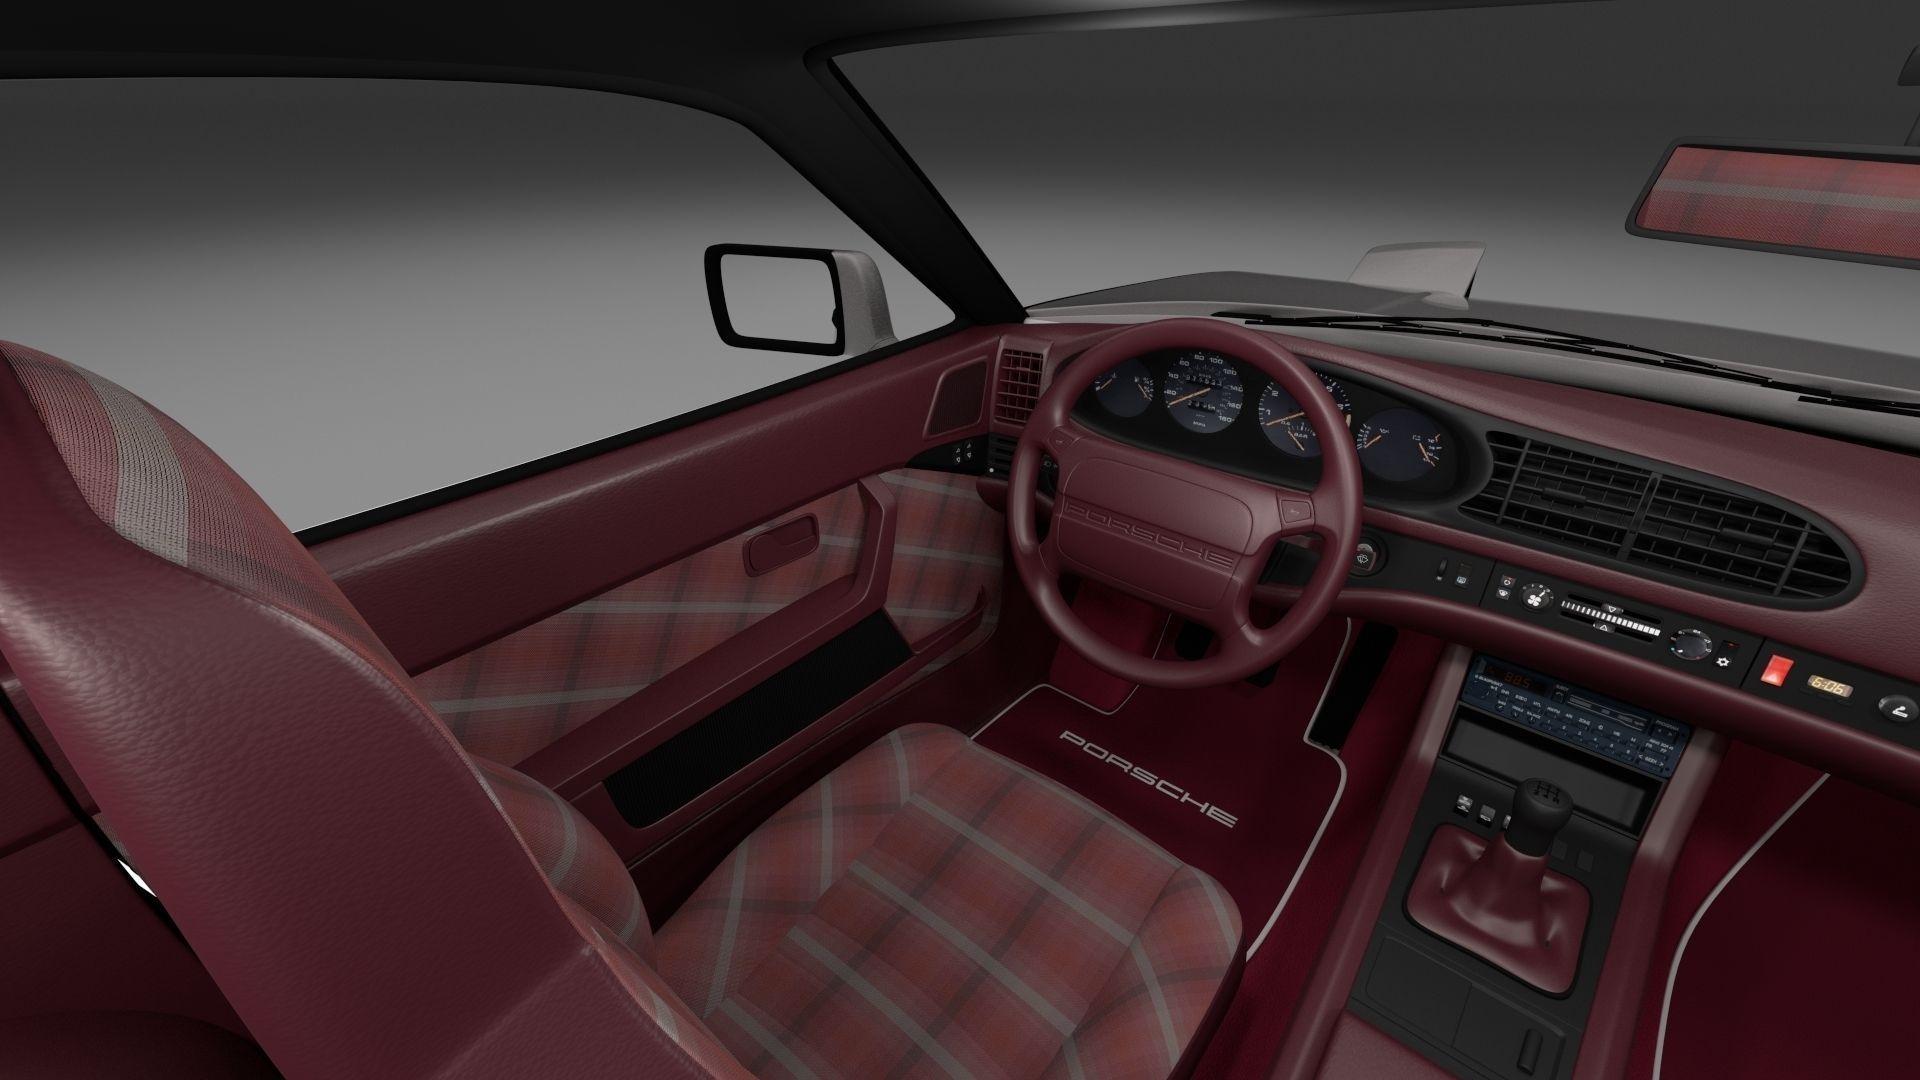 Porsche 944 turbo s with interior 3d model obj fbx stl blend dae mtl porsche 944 turbo s with interior 3d model obj fbx stl blend dae mtl 4 vanachro Gallery